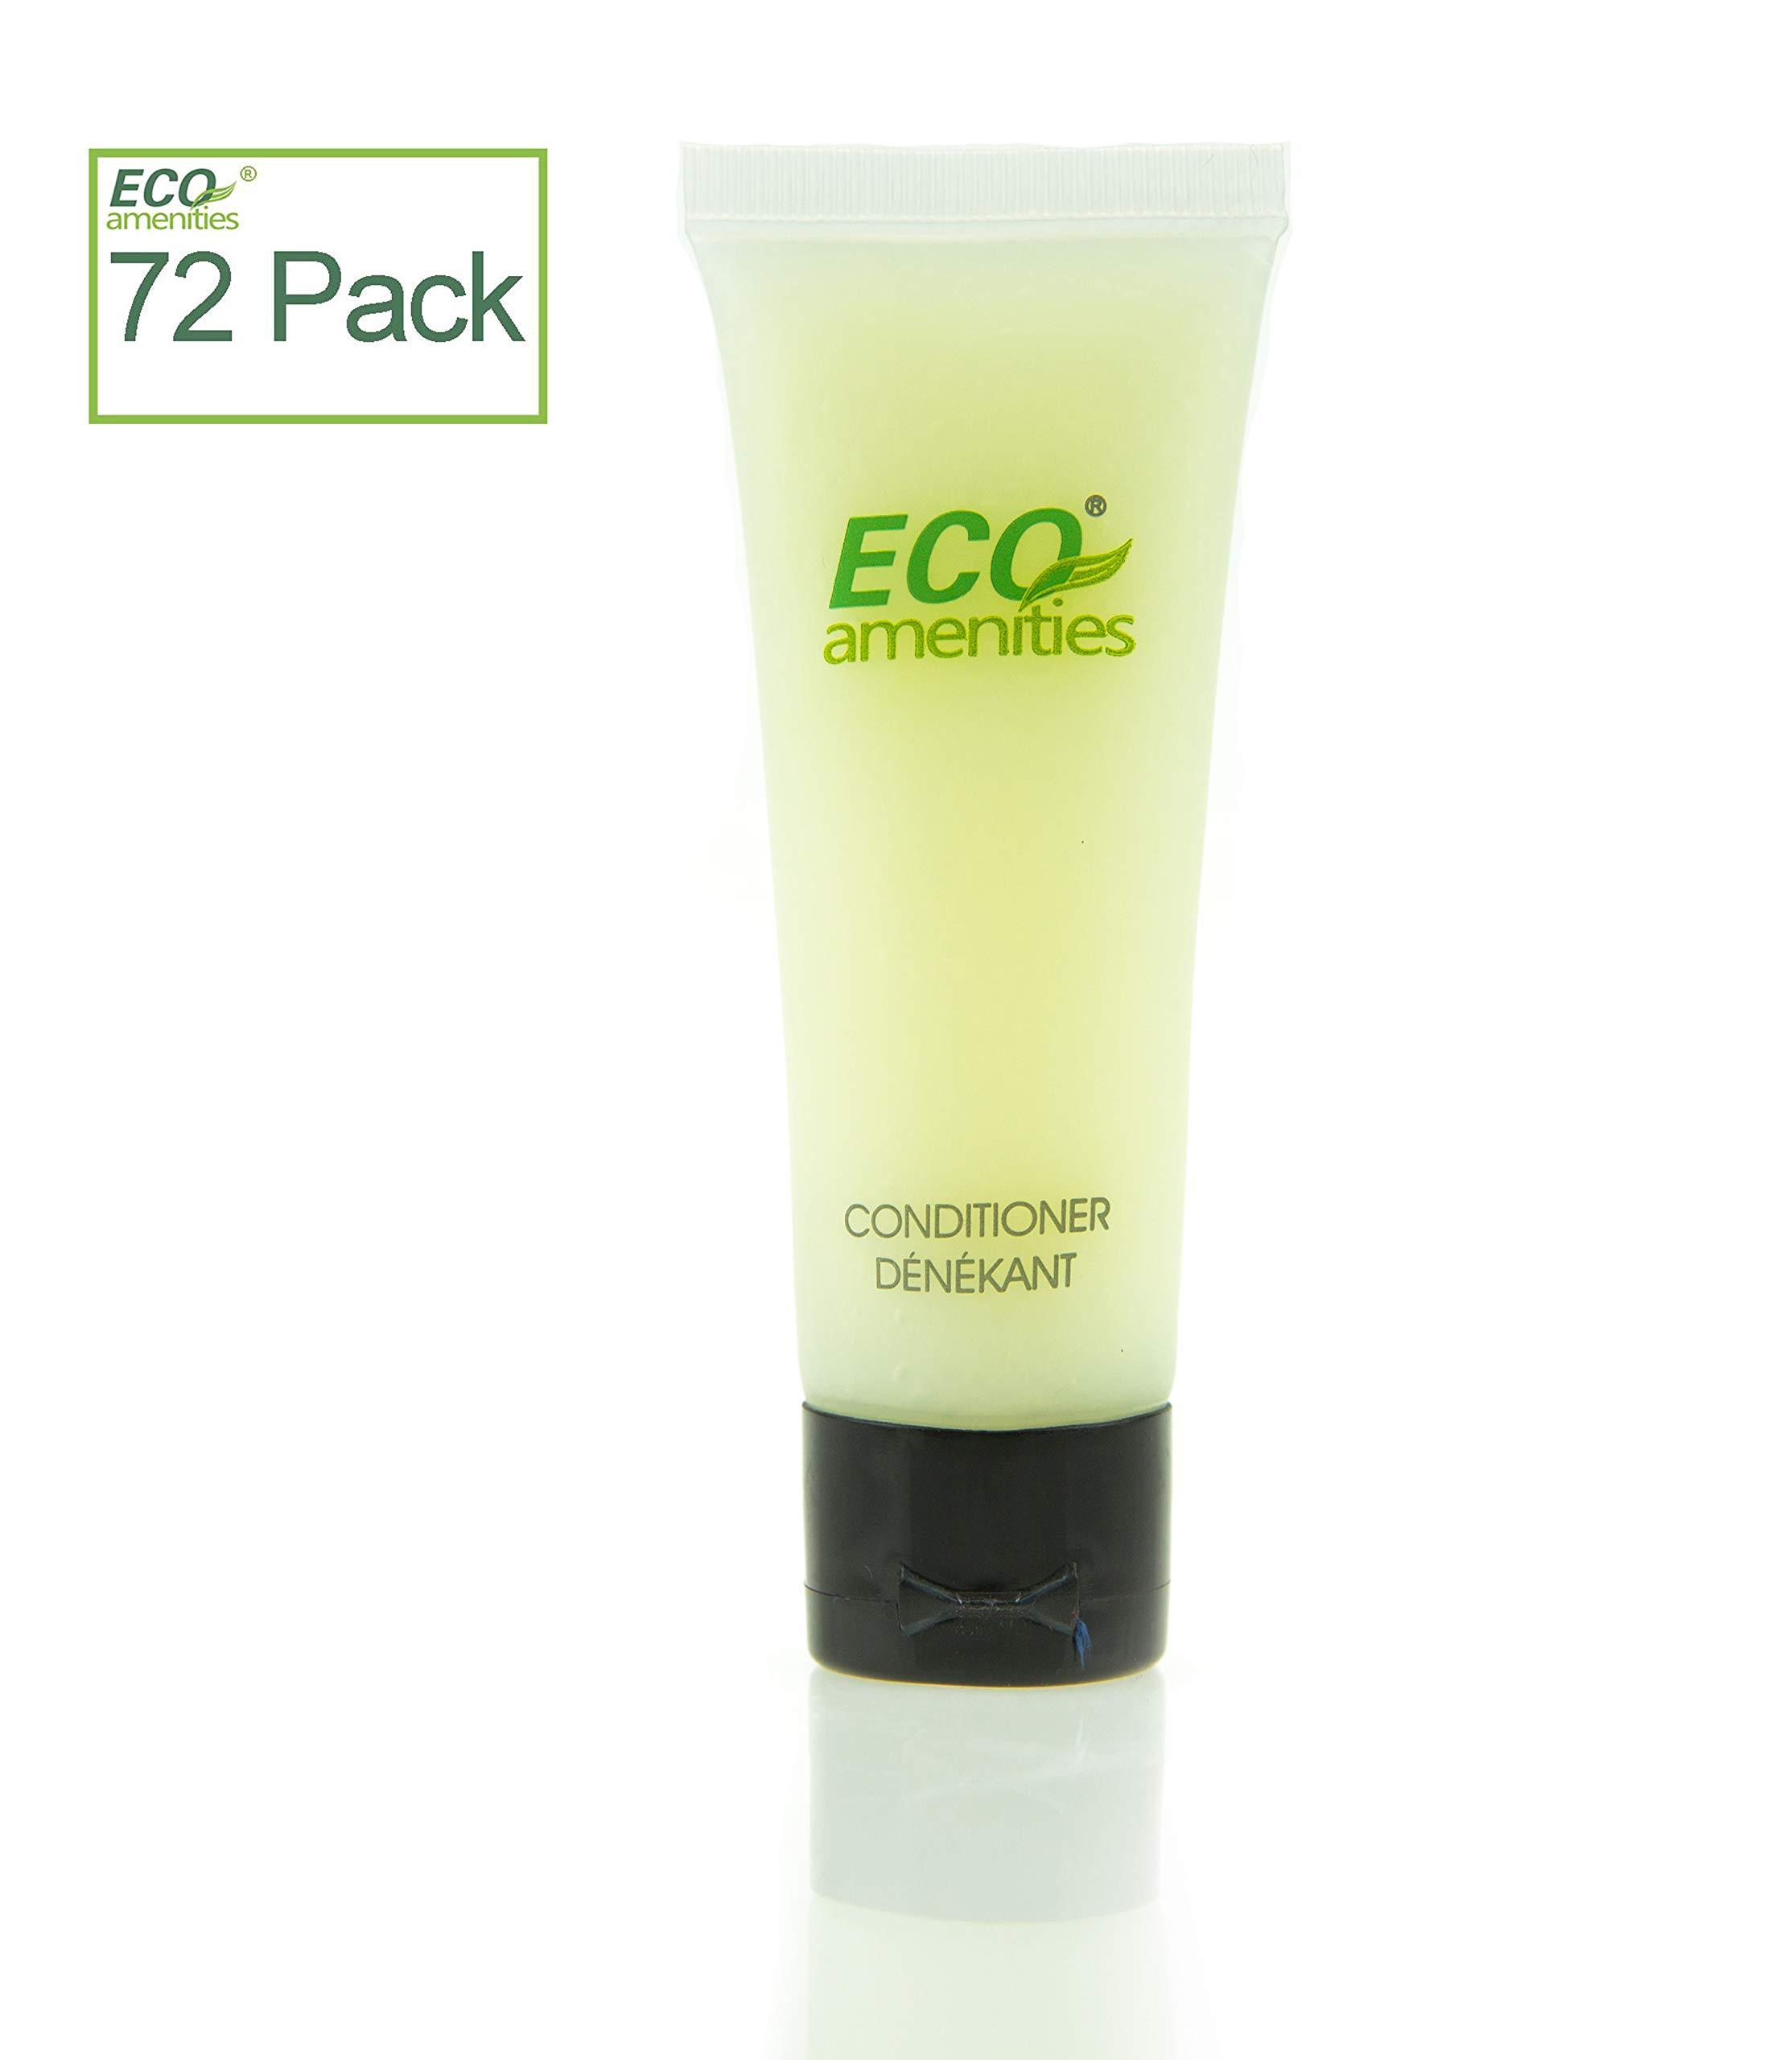 ECO AMENITIES Transparent Tube Flip Cap Individually Wrapped 30ml Conditioner, 72 Tubes per Case